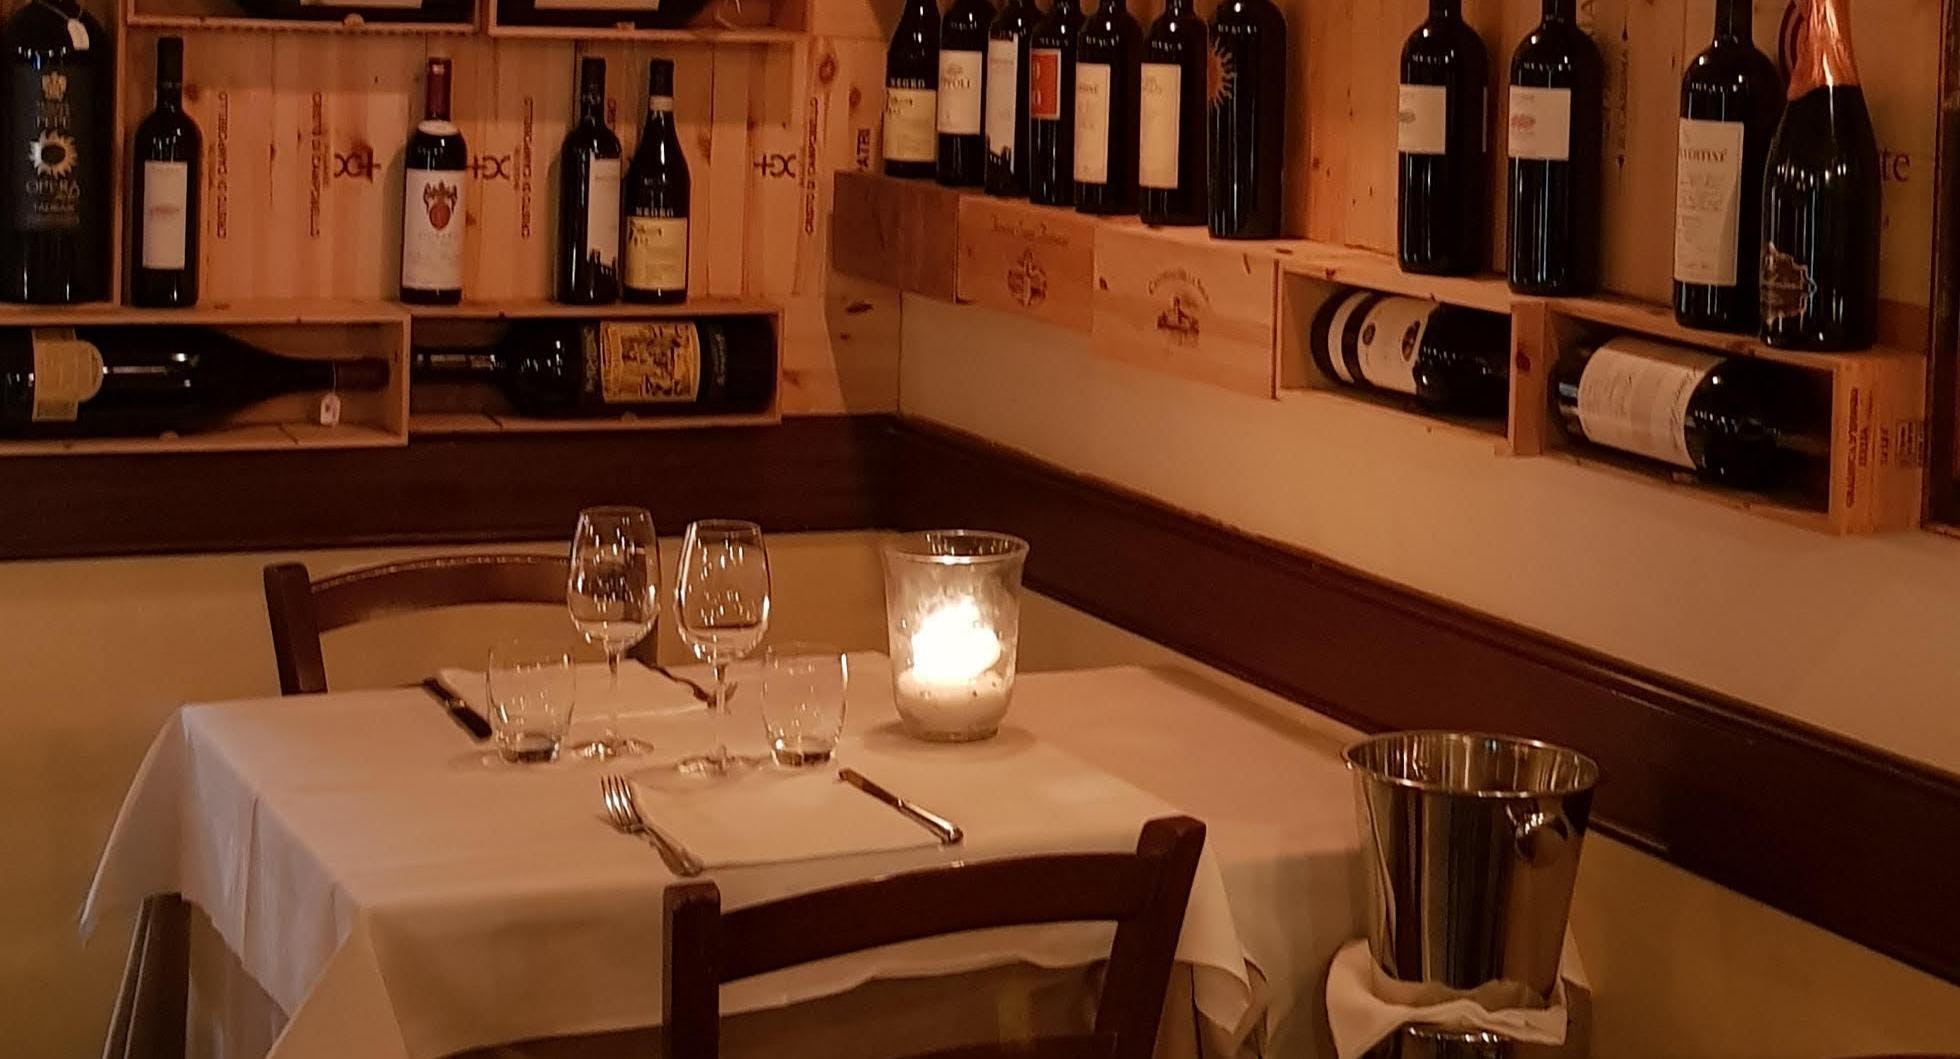 Contrario Vineria Con Cucina Rome image 1